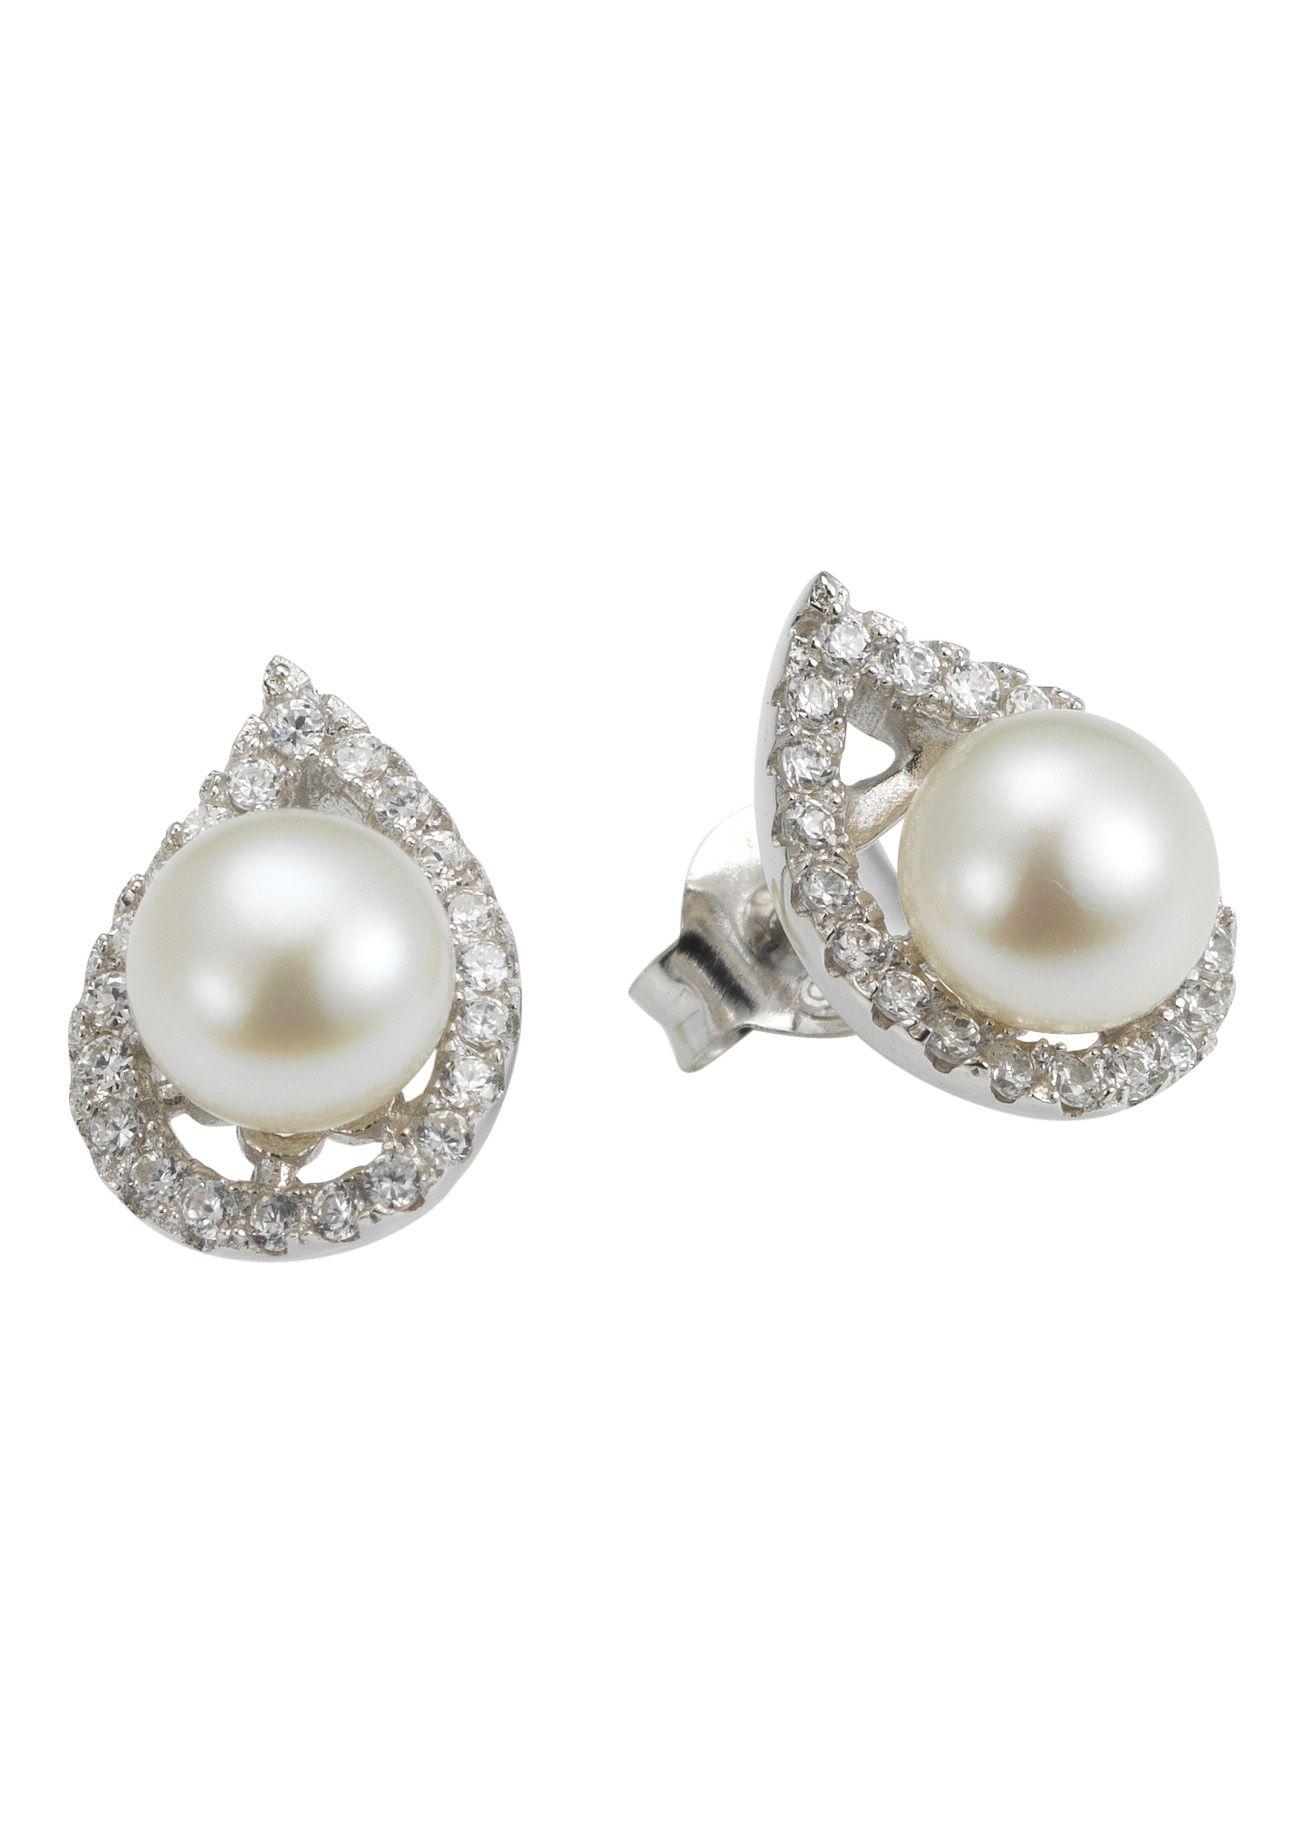 ADRIANA Adriana Paar Ohrstecker, »La mia perla A46«